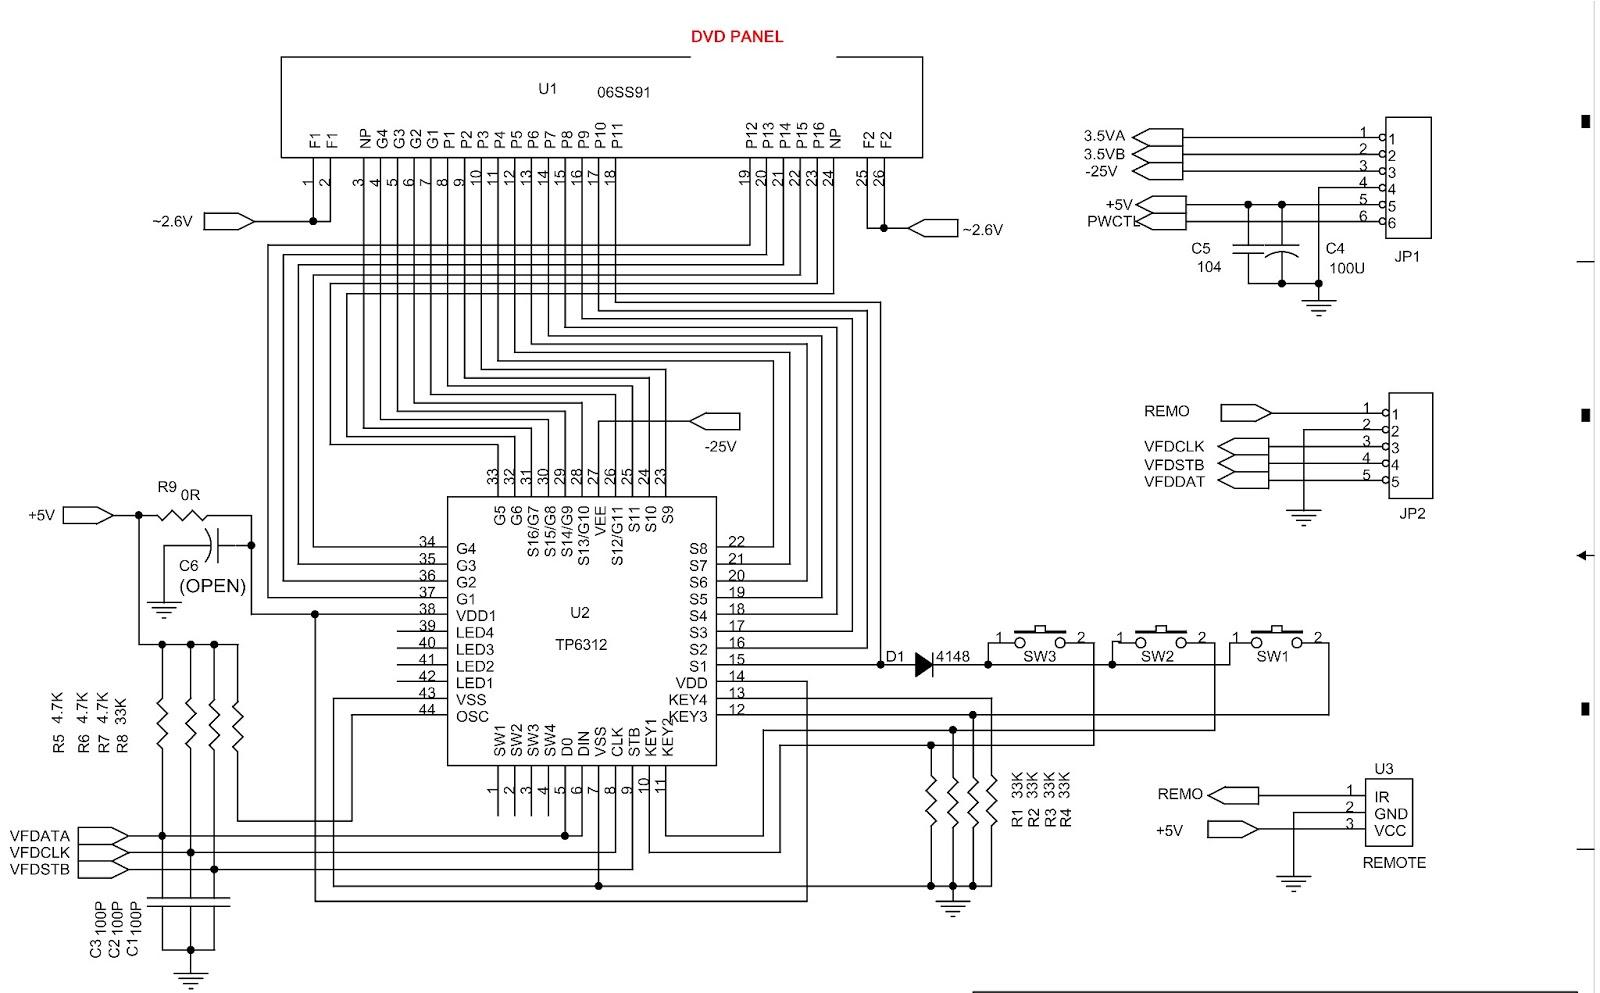 Sven Hd1030 Sanyo Hd60 Servo Dvd Panel Scheatic Diagram S15 Toshiba Inverter Wiring Diagrams